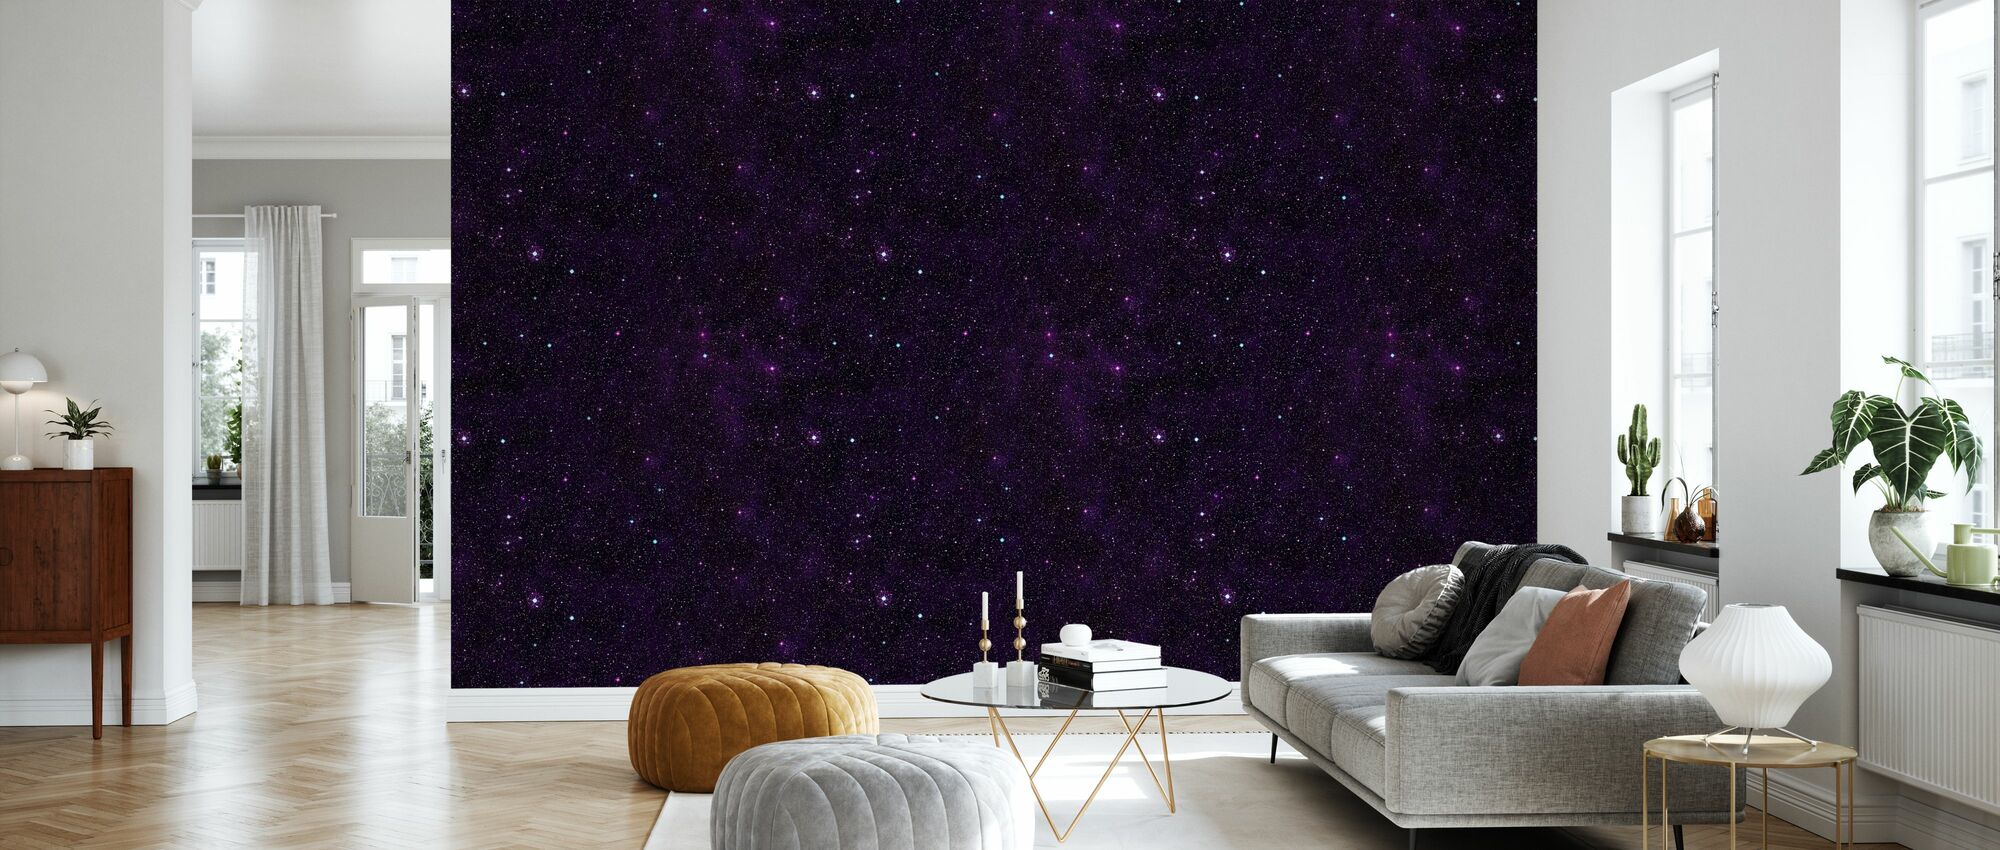 Starfield Purp - Wallpaper - Living Room